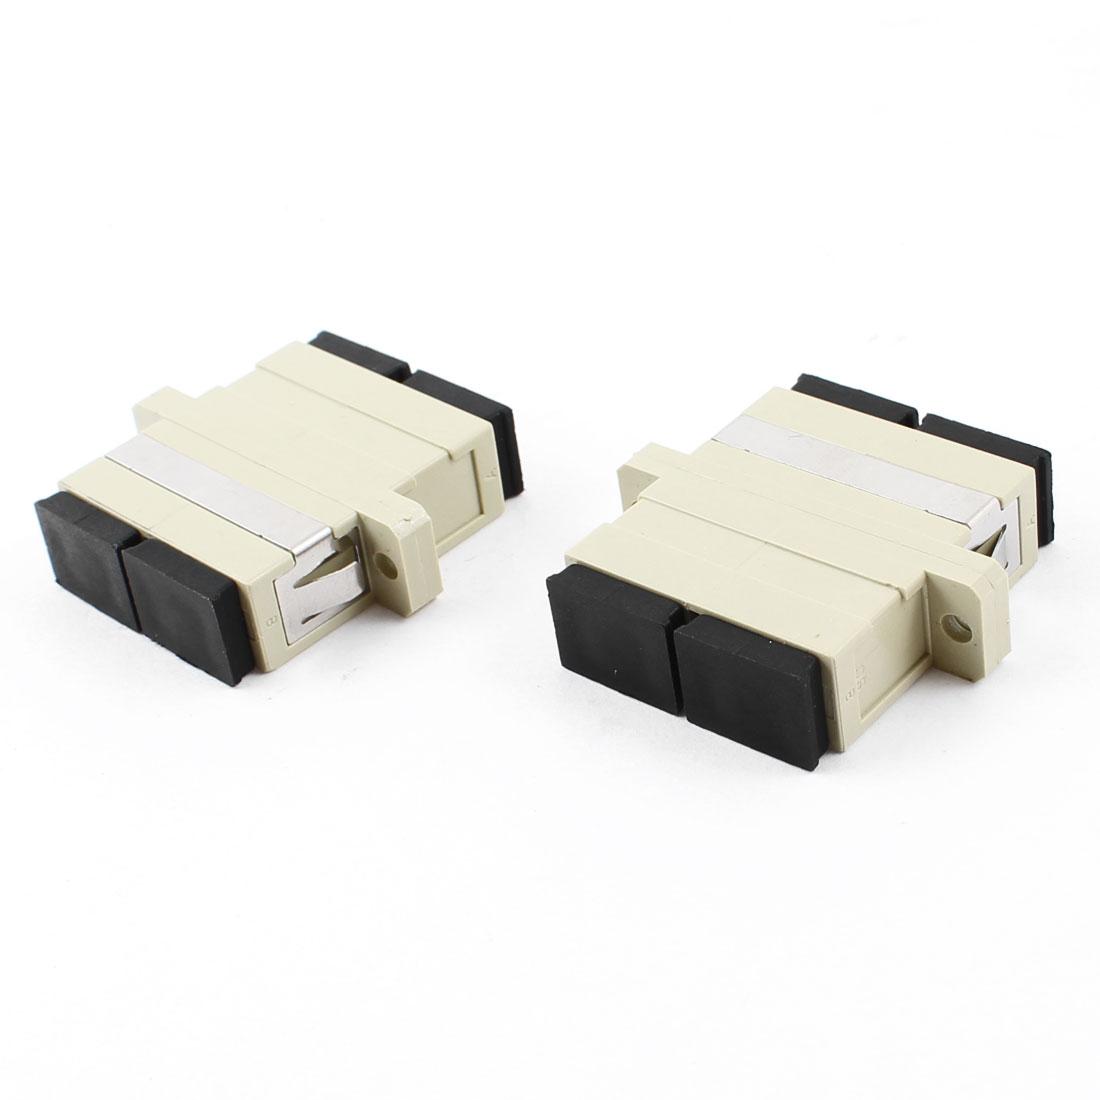 SC/SC Duplex Flange Type Fiber Optic Connector Adapter Coupler 2 PCS